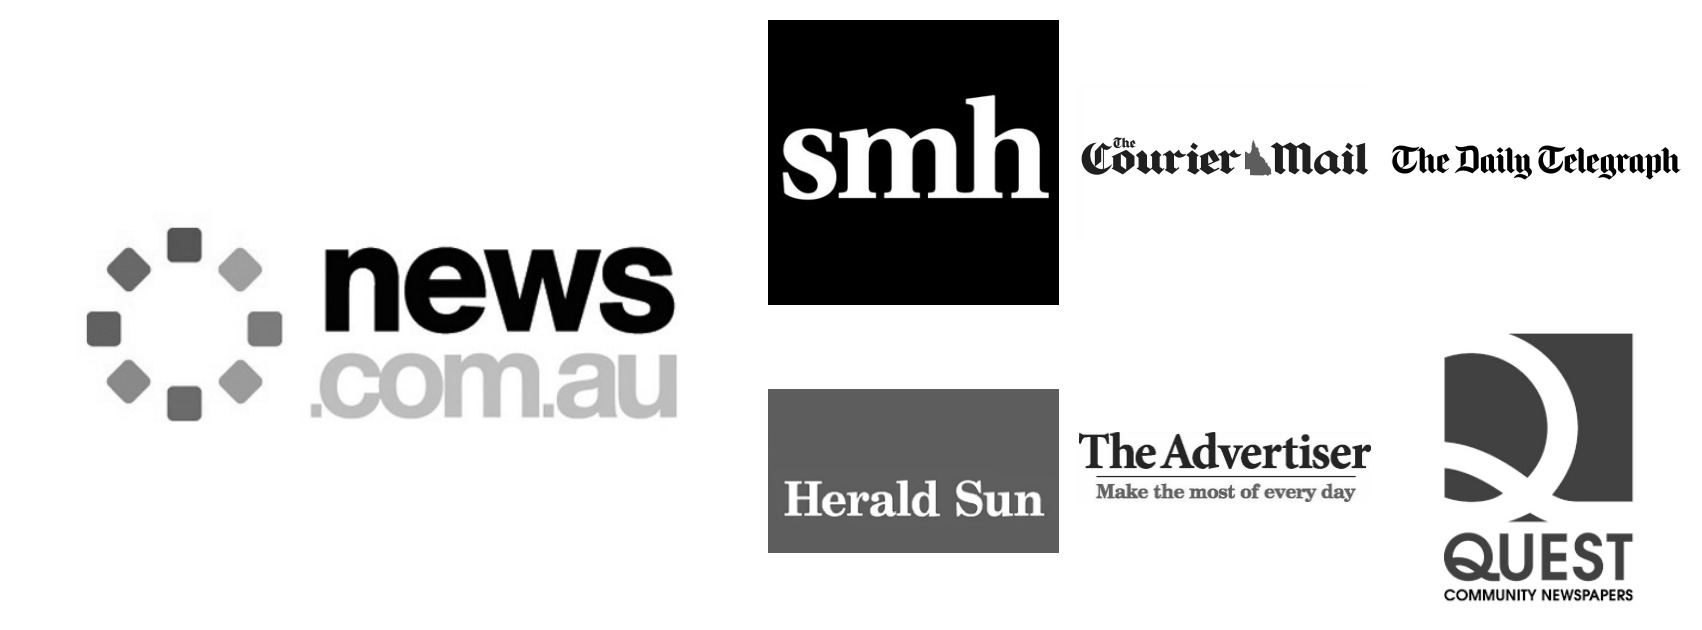 print-media-collage